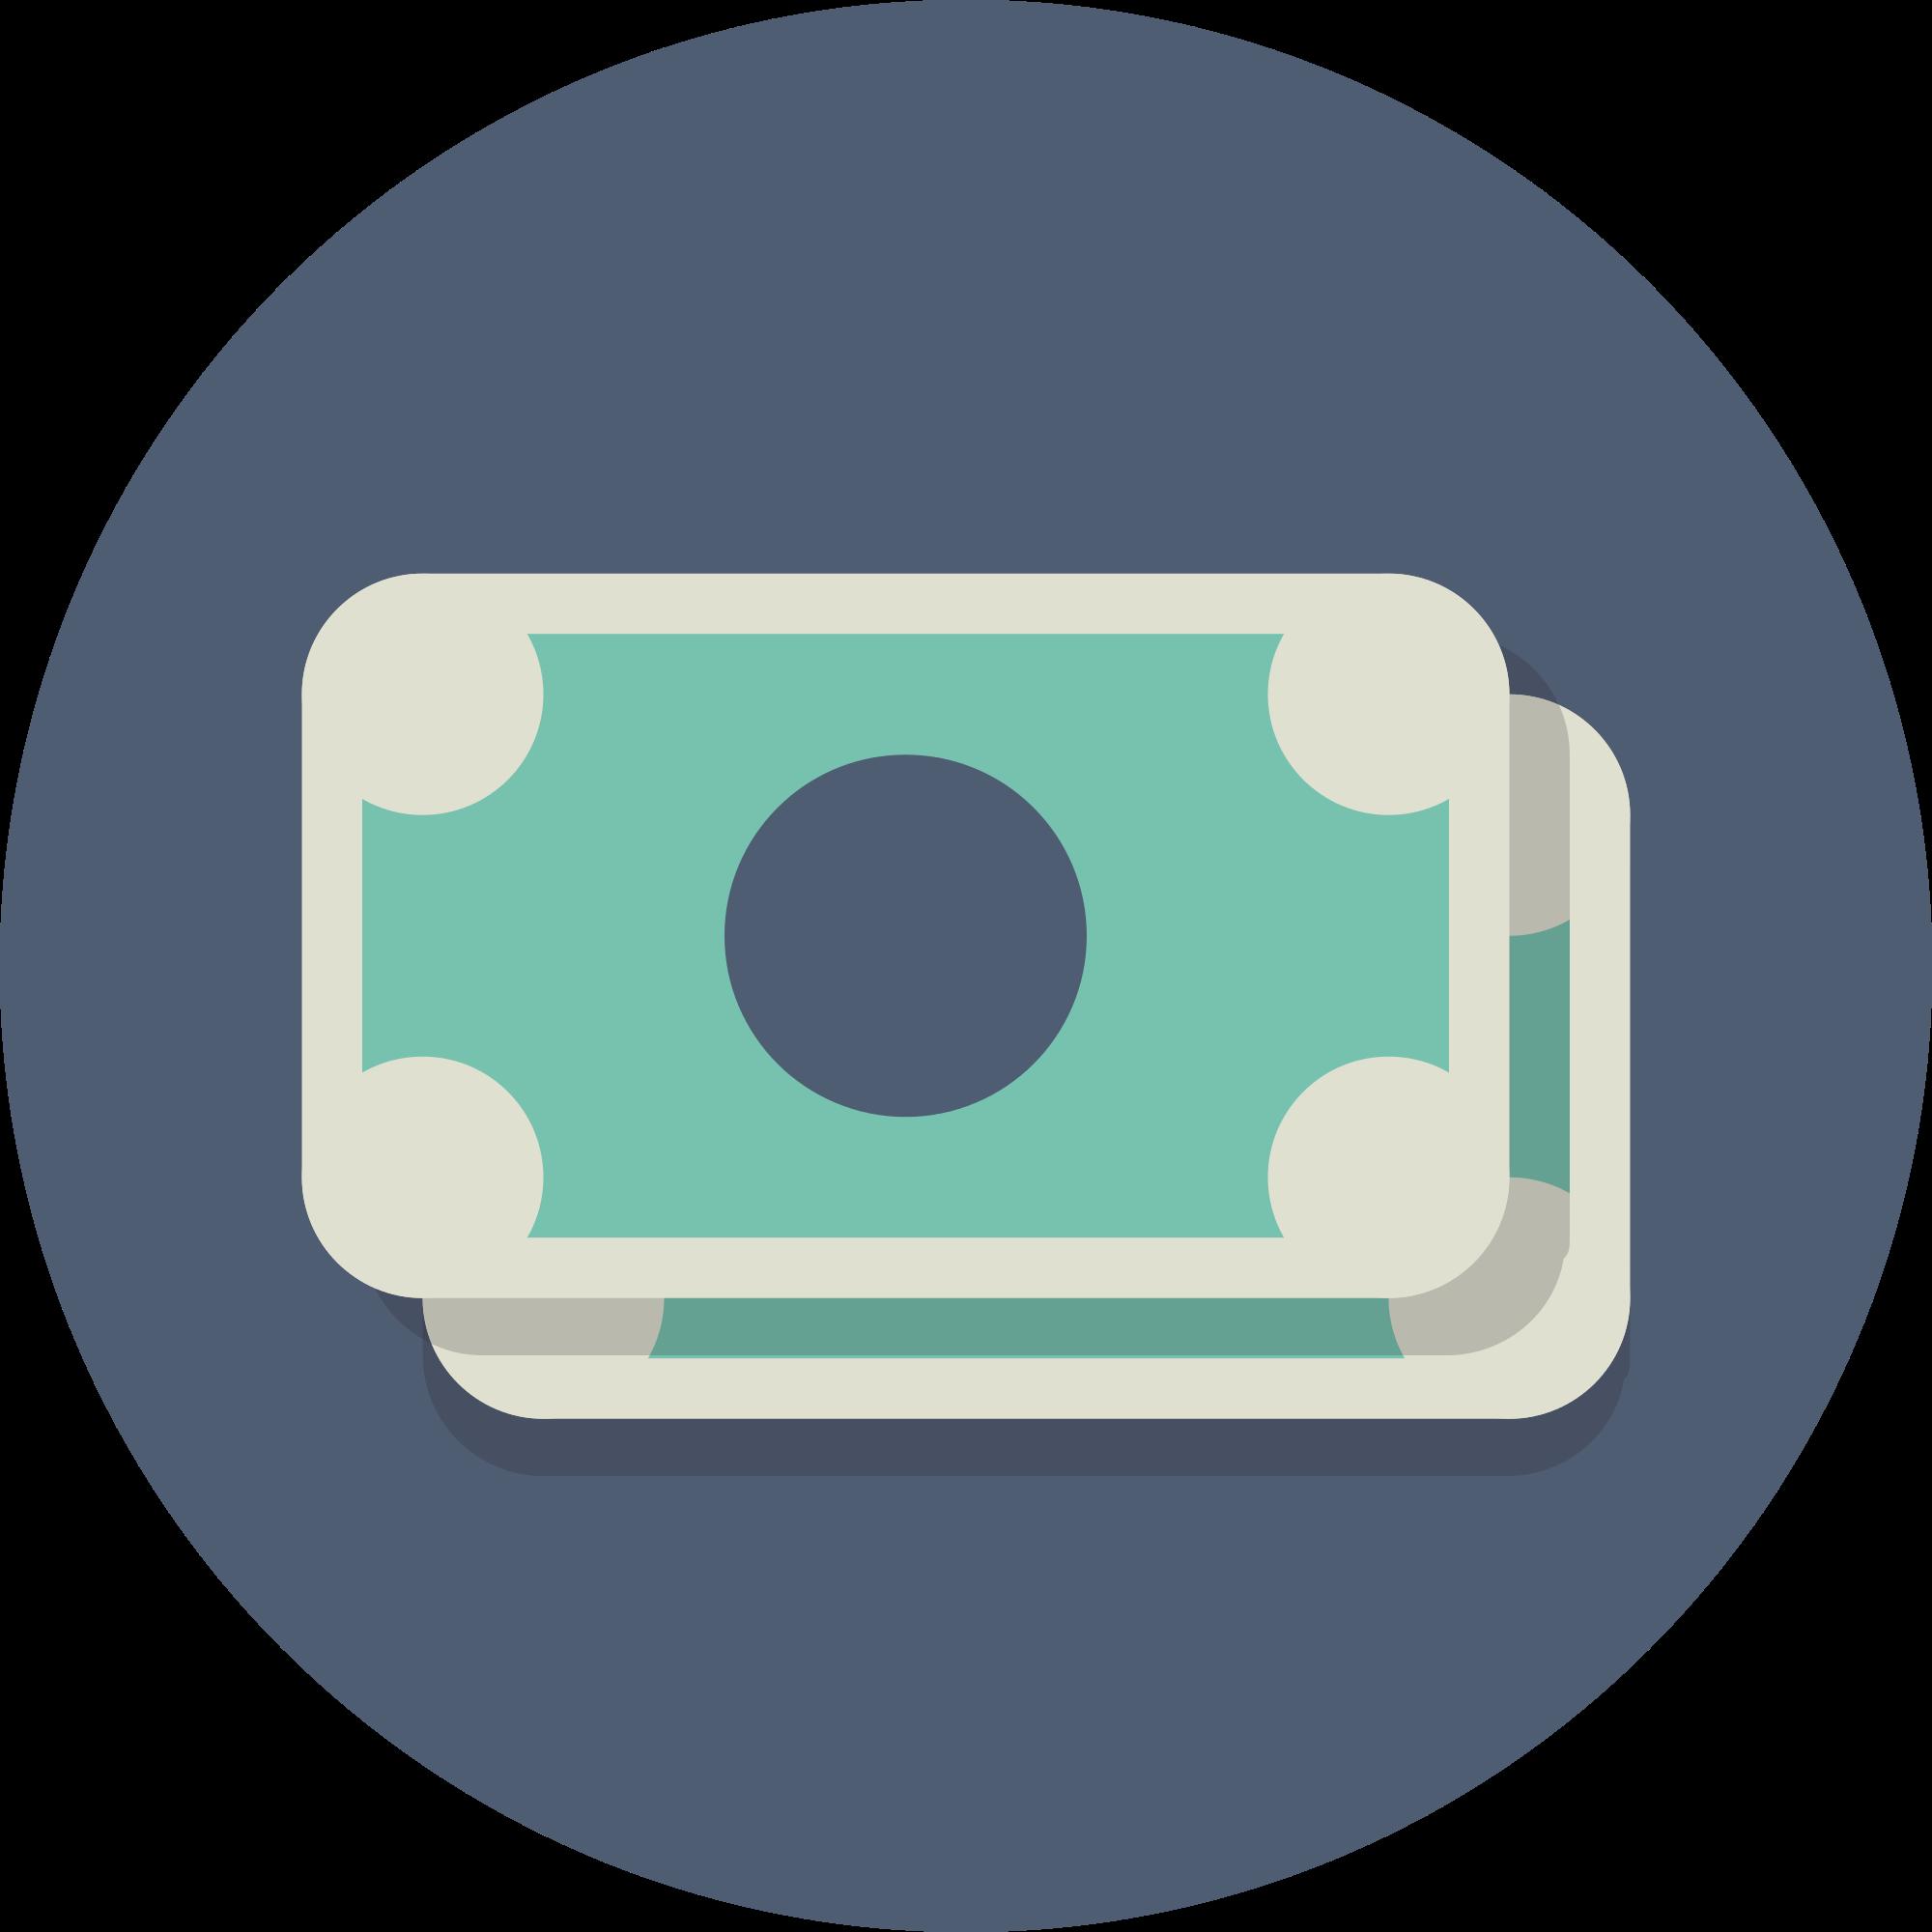 banner download svg graphic money #104302397